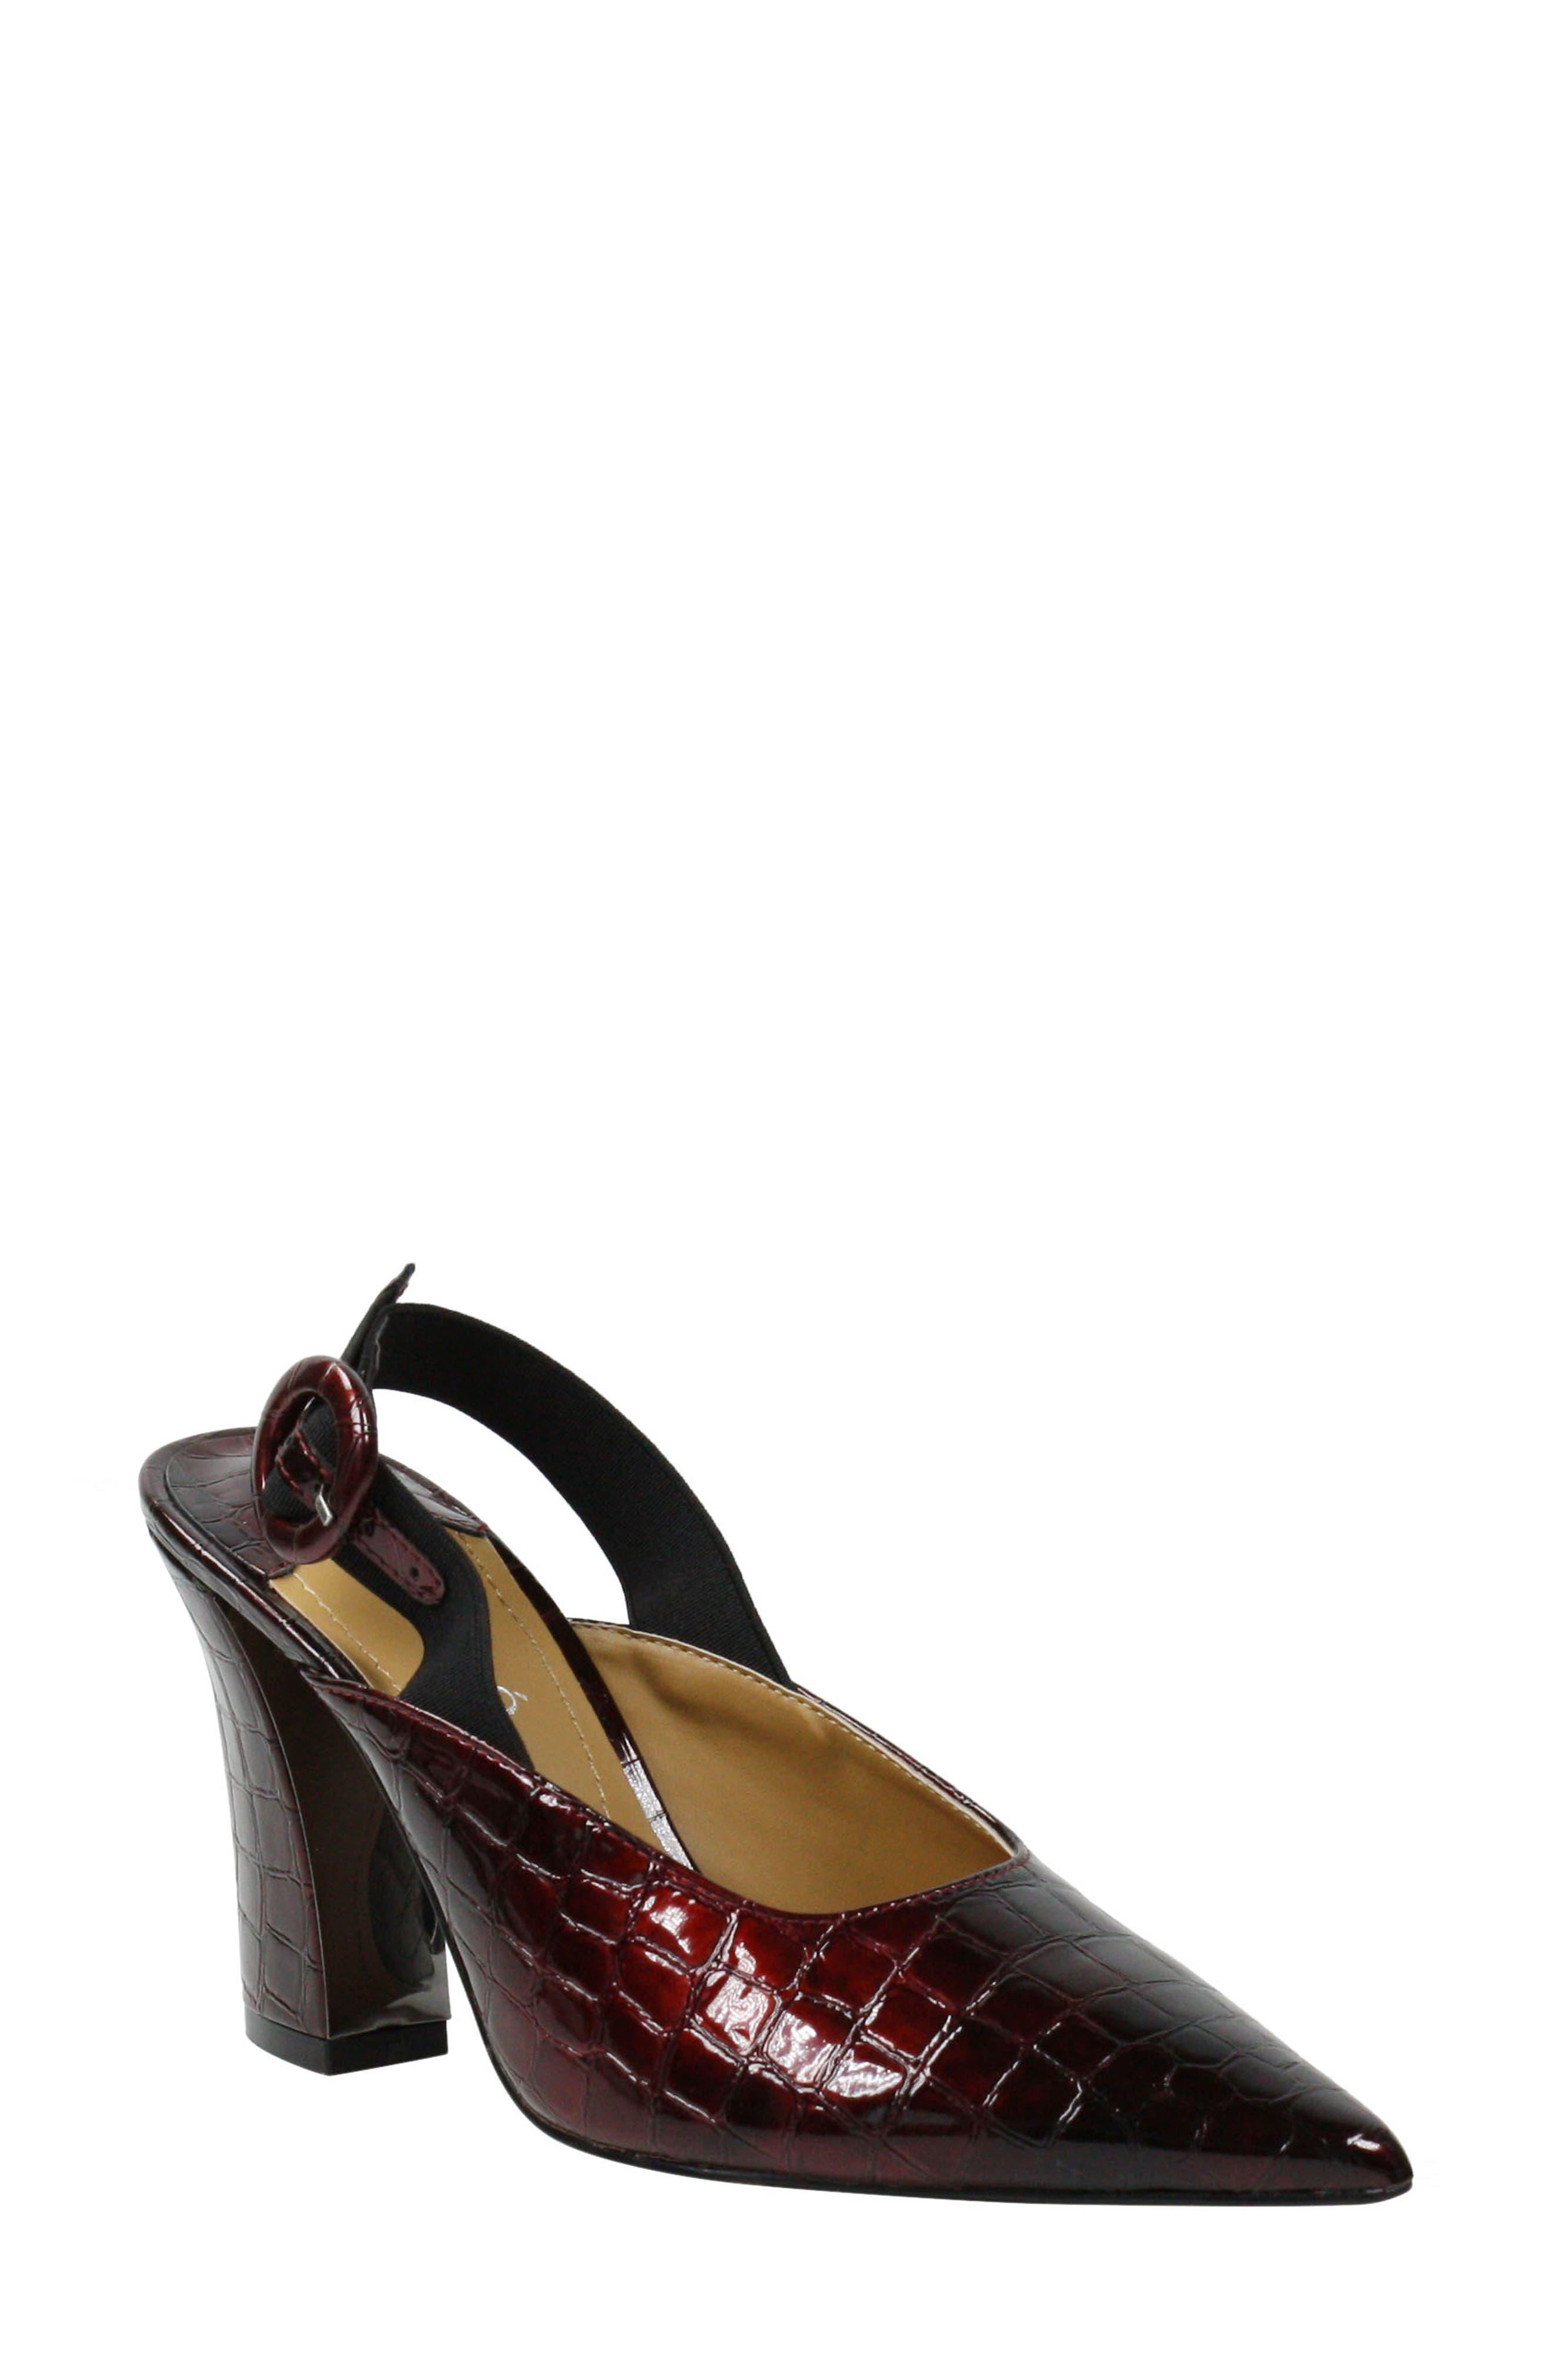 Image of J. Renee Marianela Croc Embossed Pointed Toe Pump - Wide Width Available